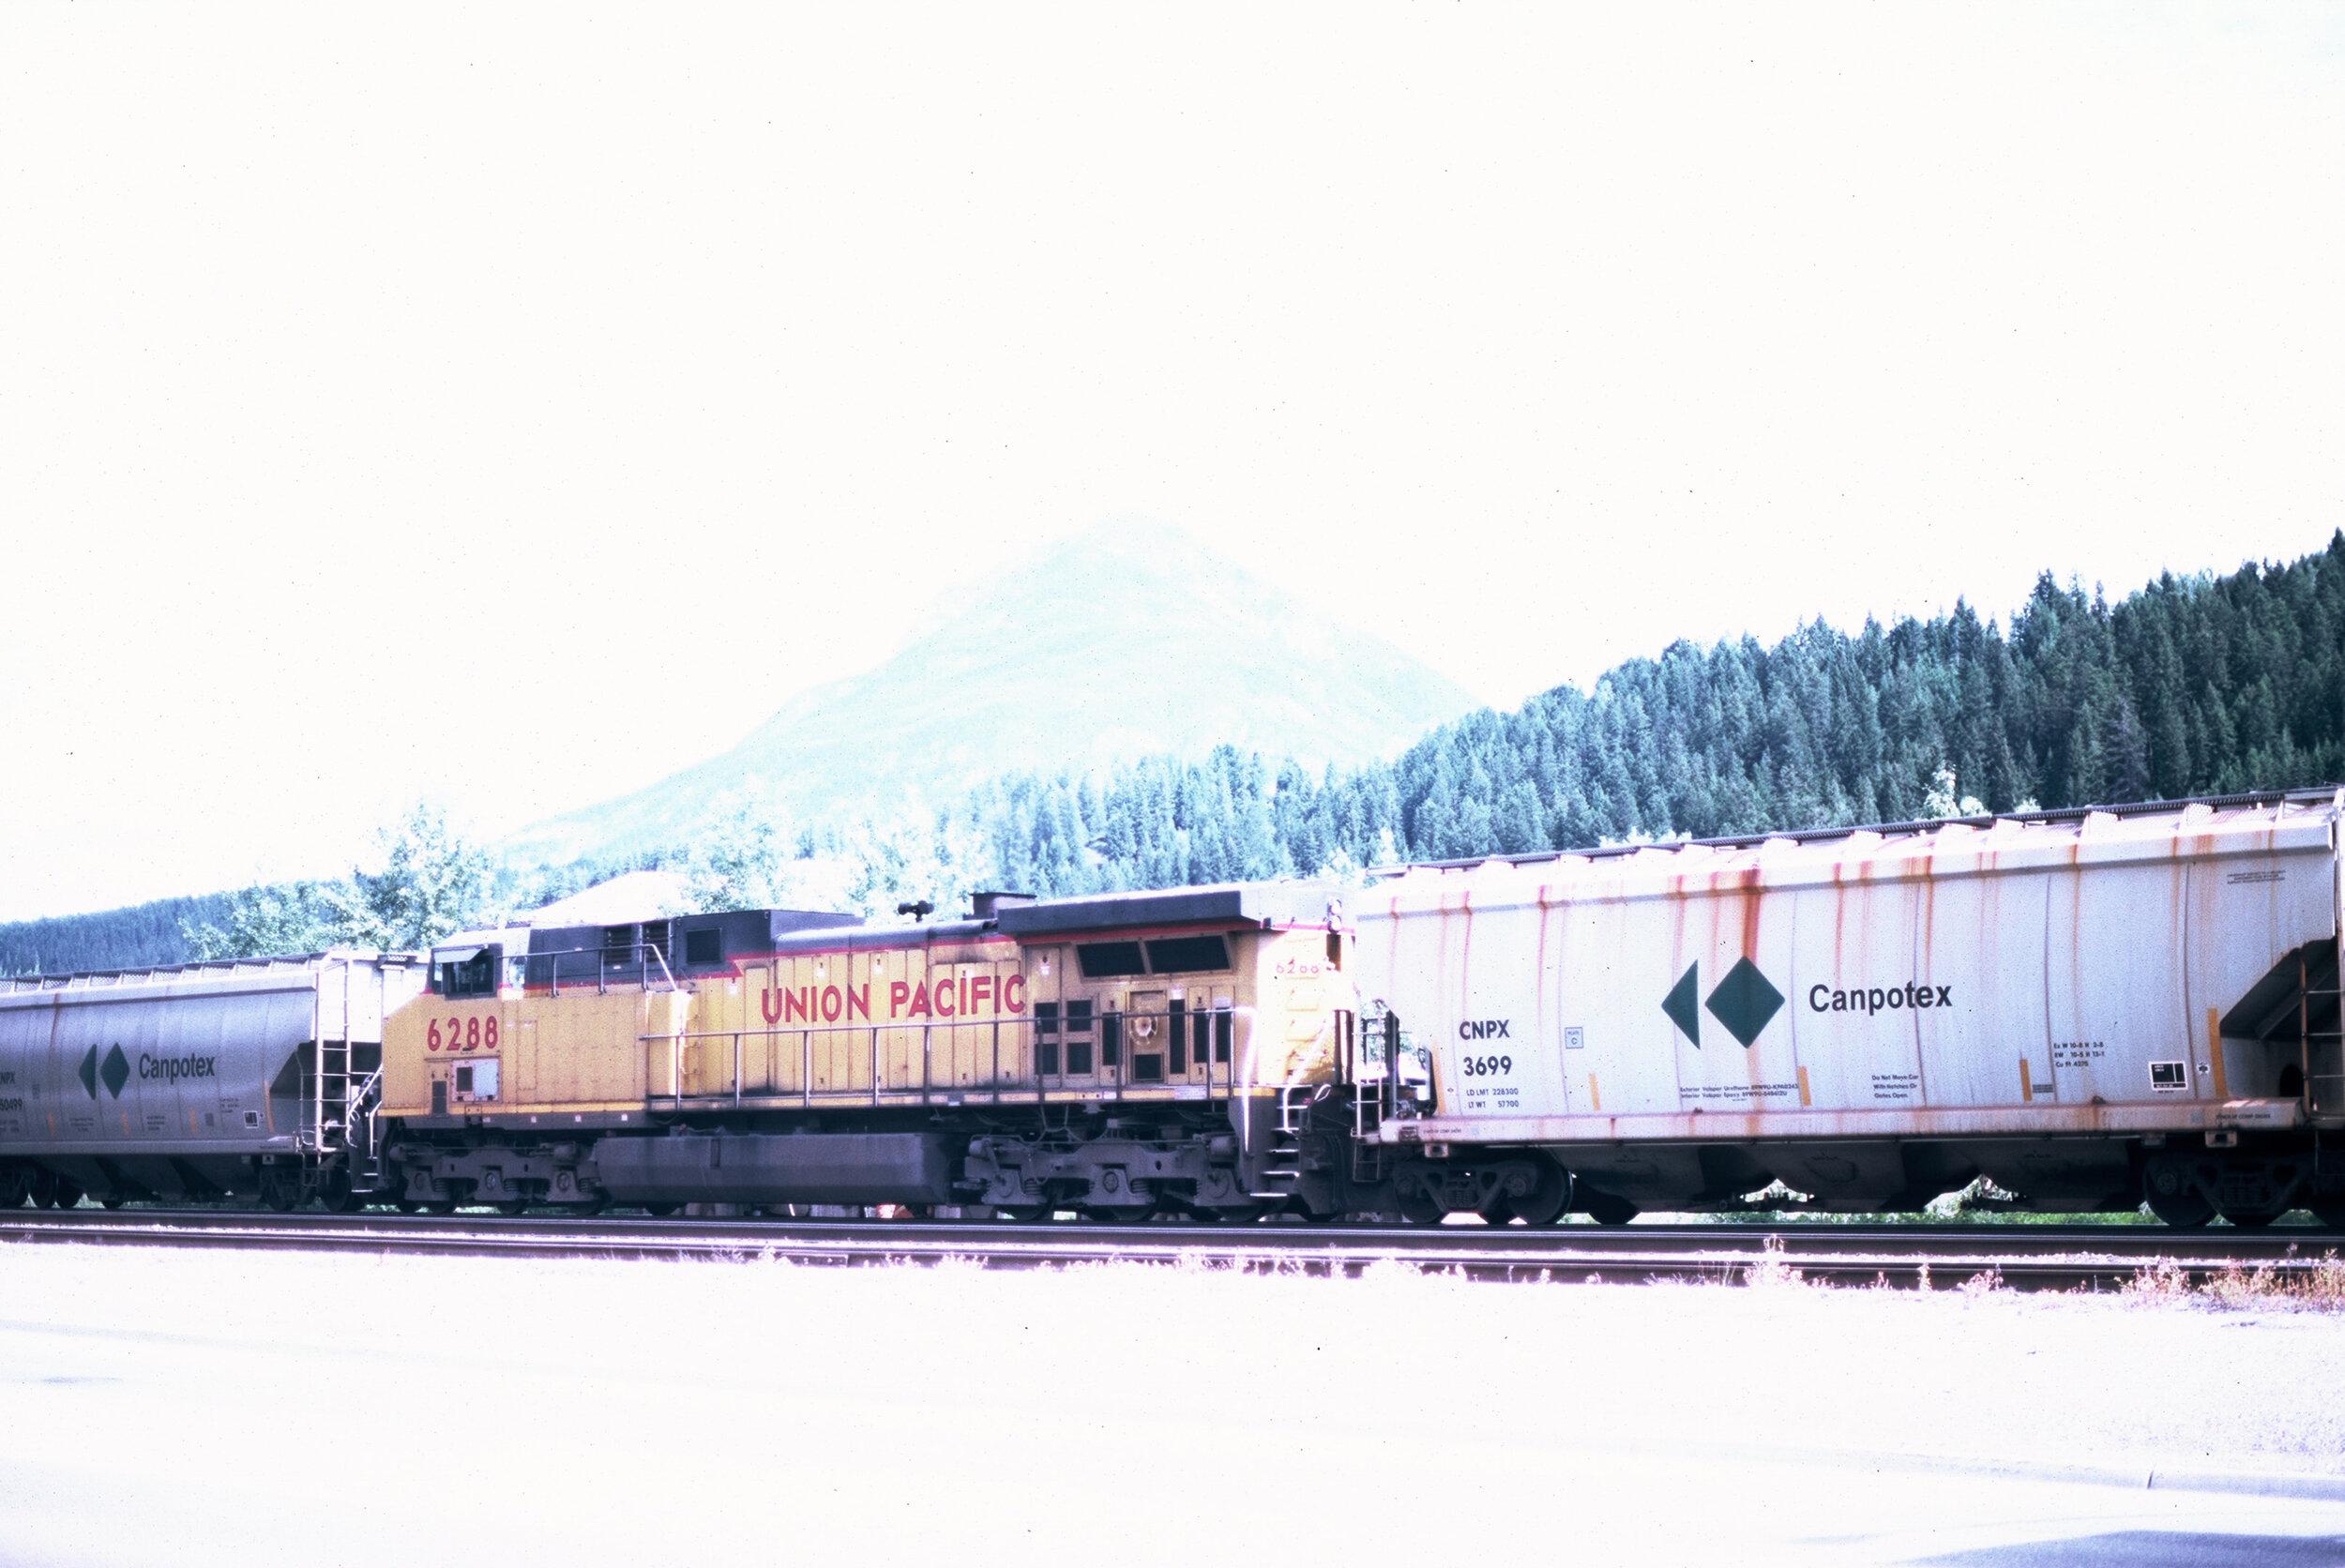 Canadian Rockies Banff Jasper Alberta Mountains 35mm SLR Canon A1 Sample Provia 100f Film Golden Union Pacific